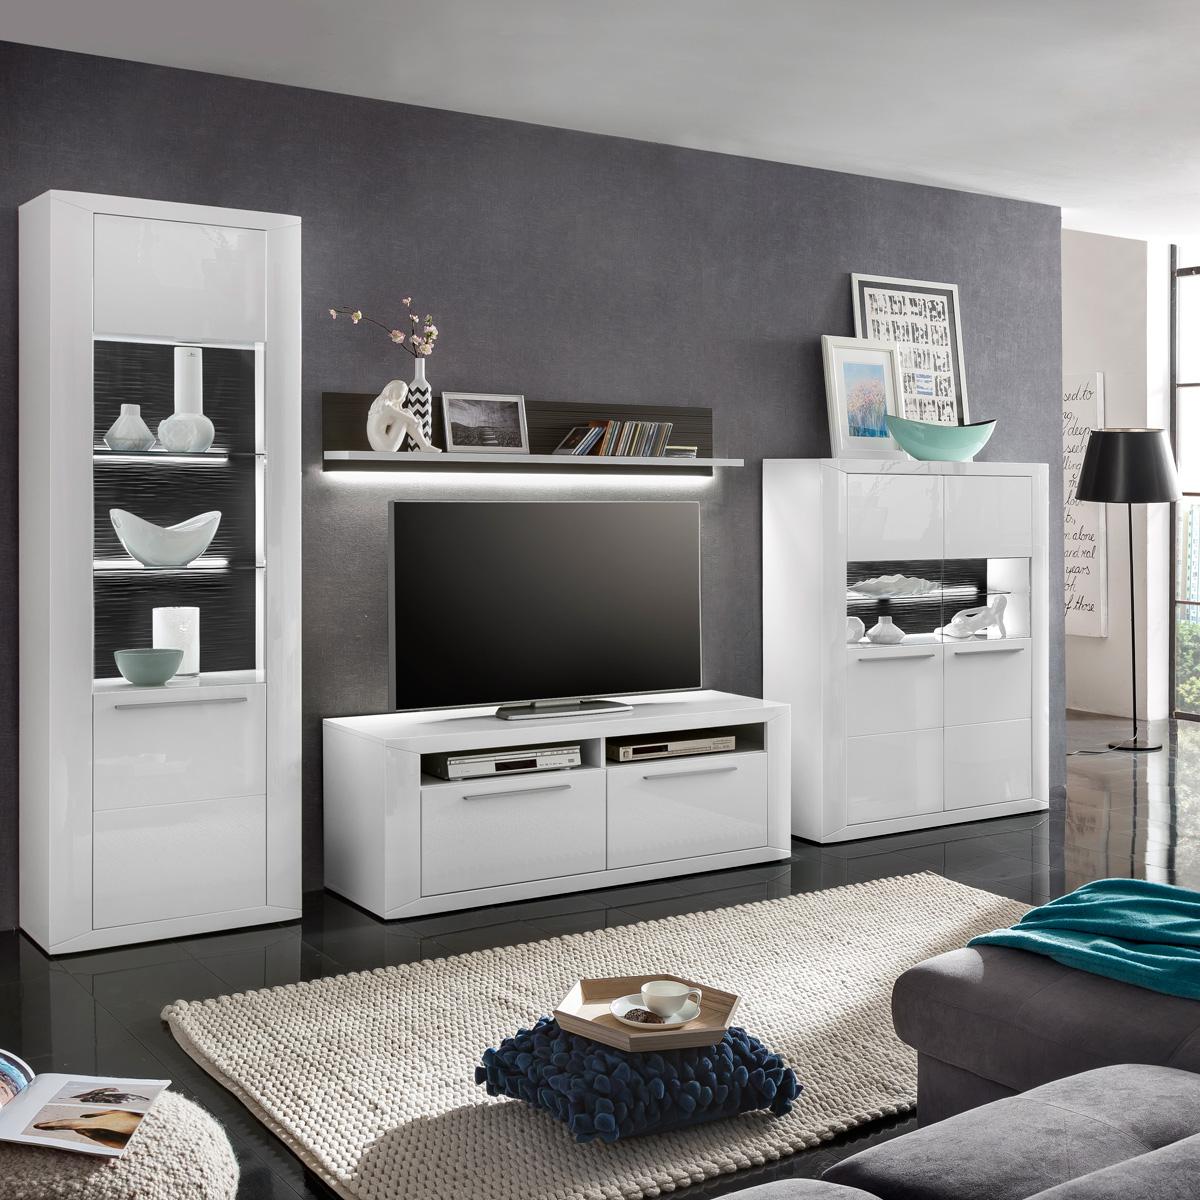 wohnwand padua anbauwand wohnkombi in wei hochglanz und grau ebay. Black Bedroom Furniture Sets. Home Design Ideas